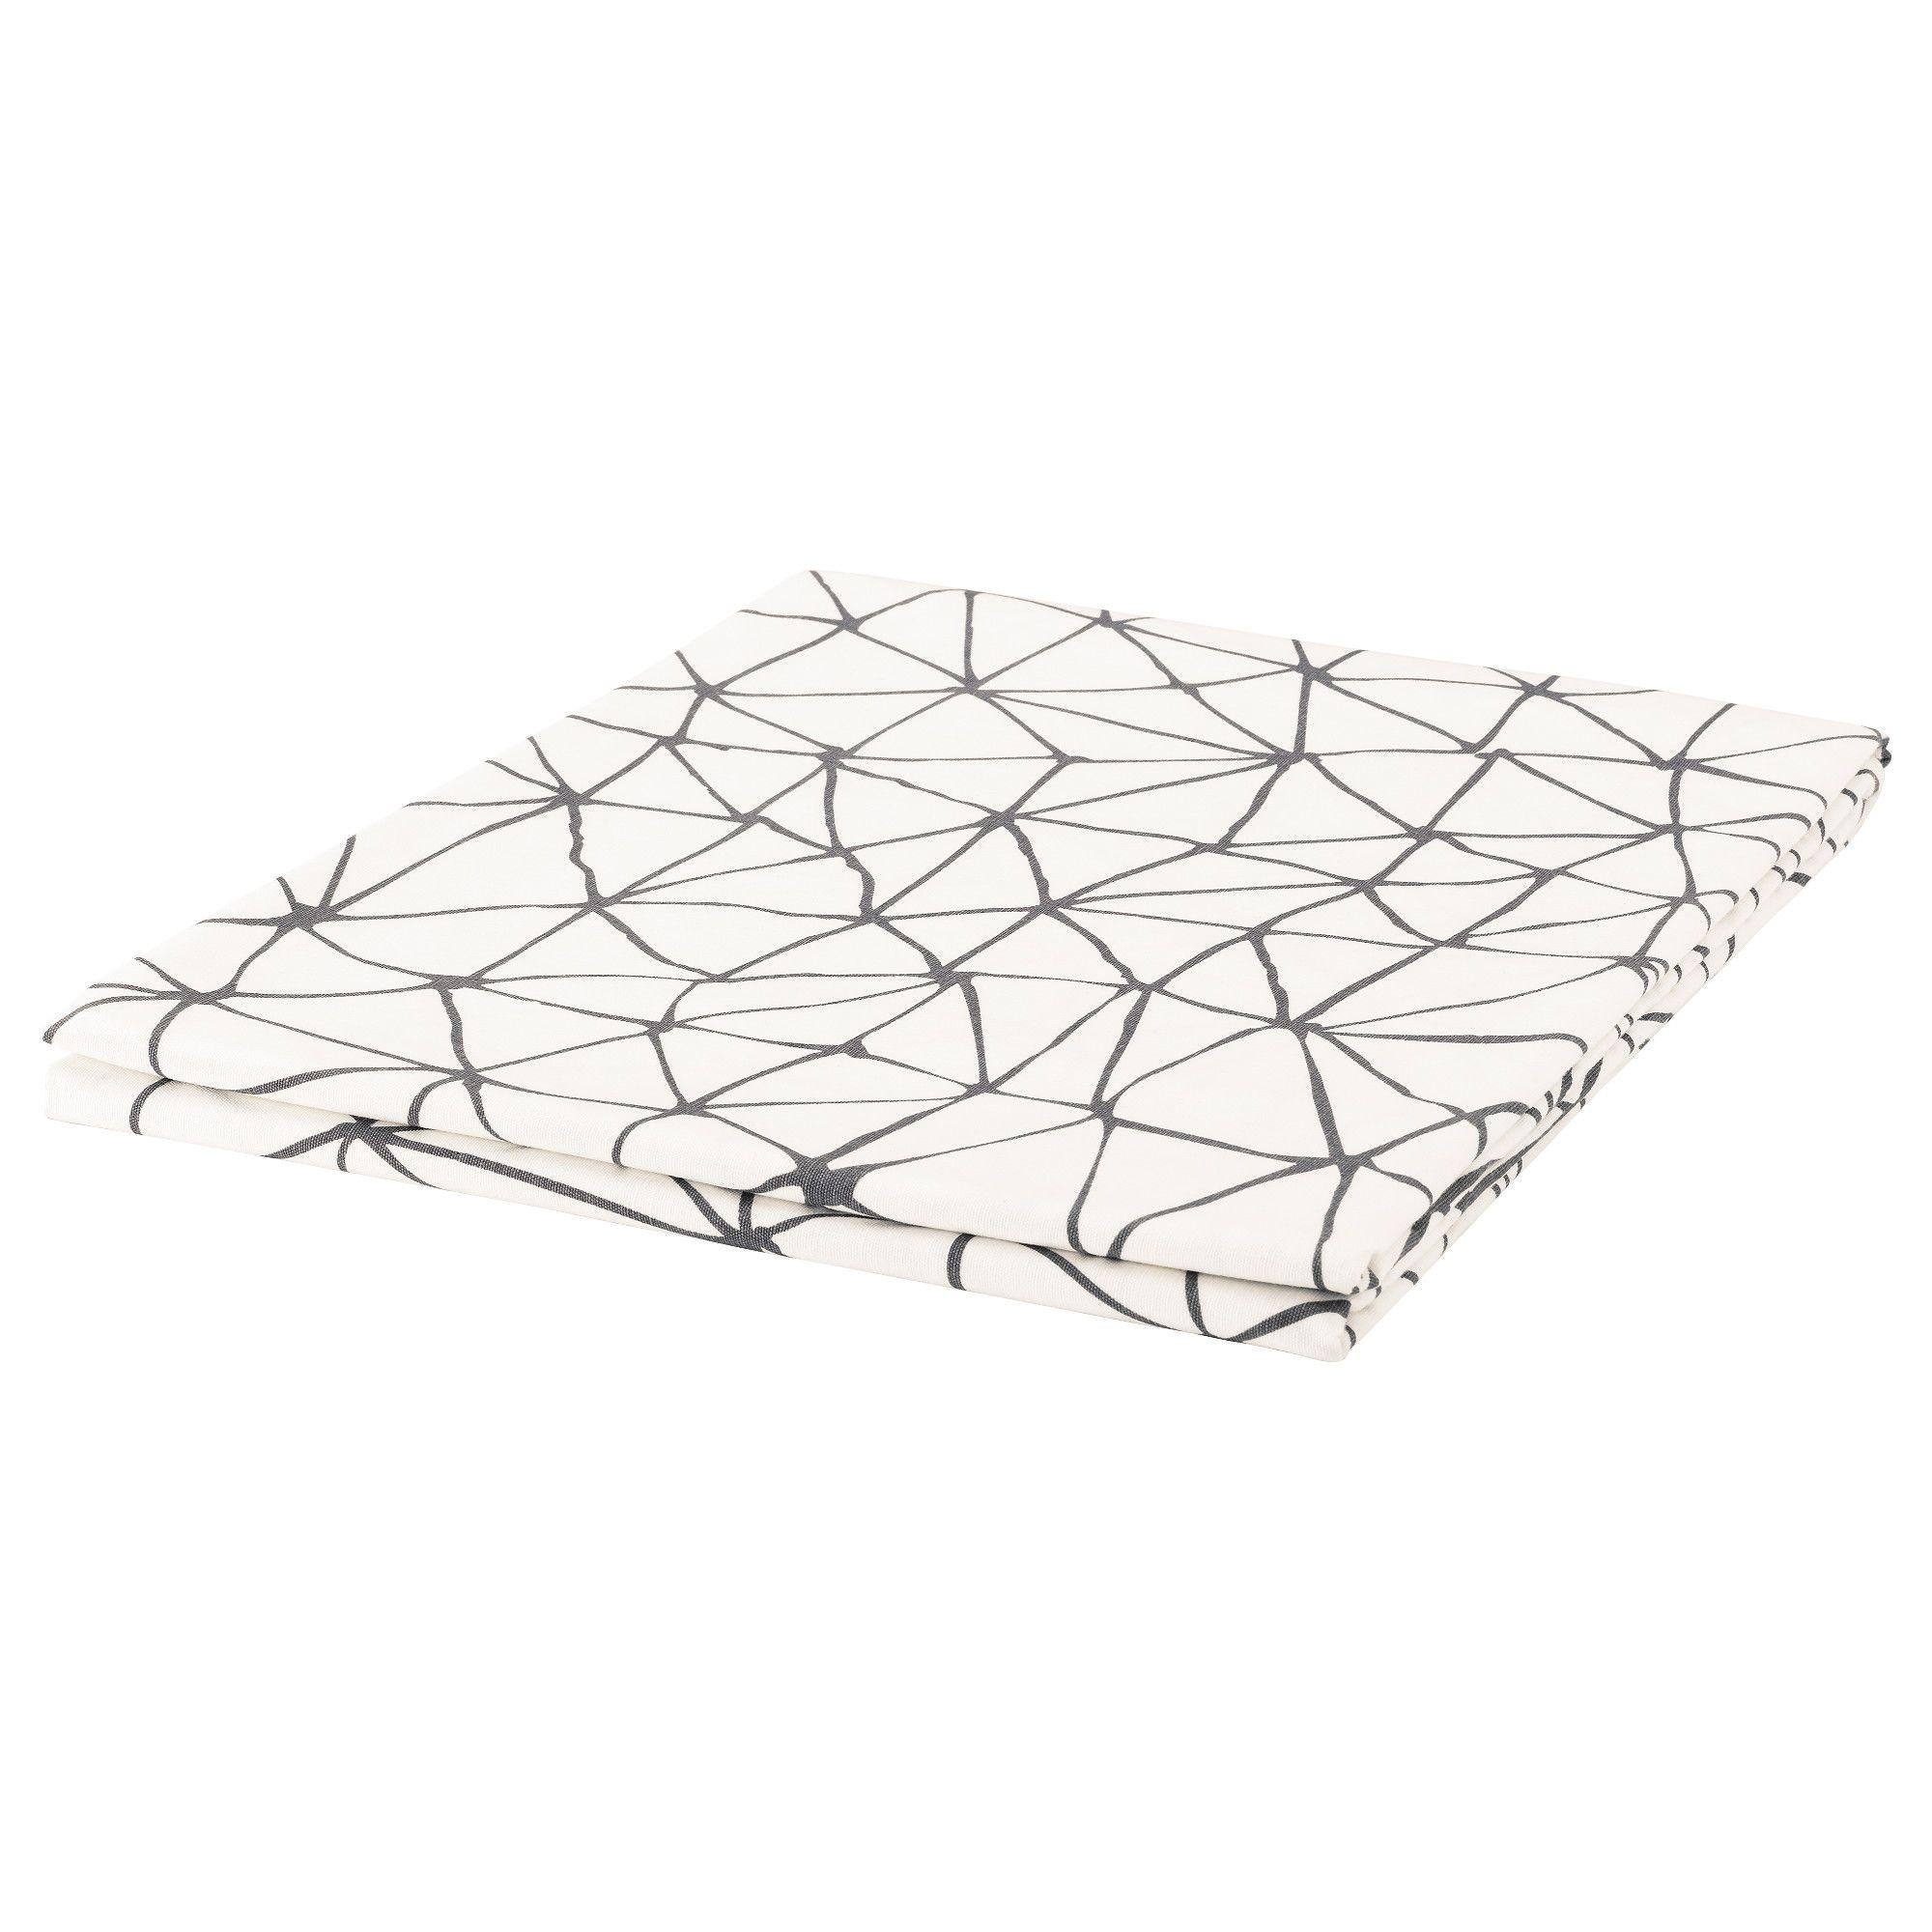 Vinter 2015 Nappe Ikea Ikea Pinterest Sofa Bed Mattress